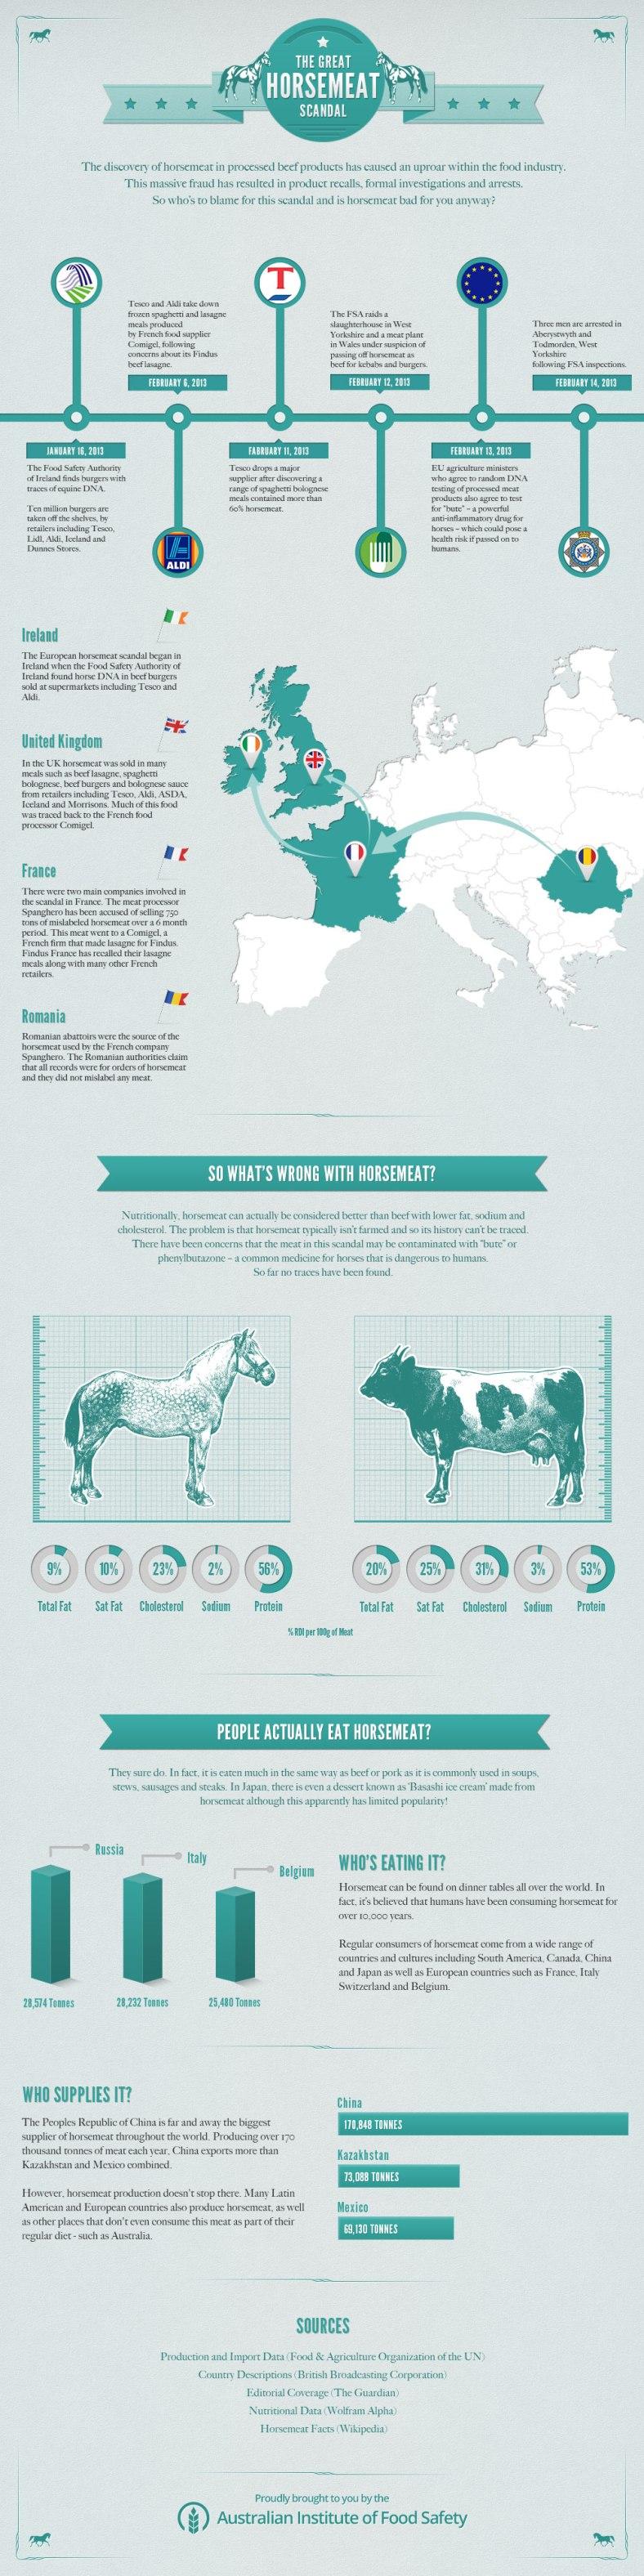 infographic-horsemeat